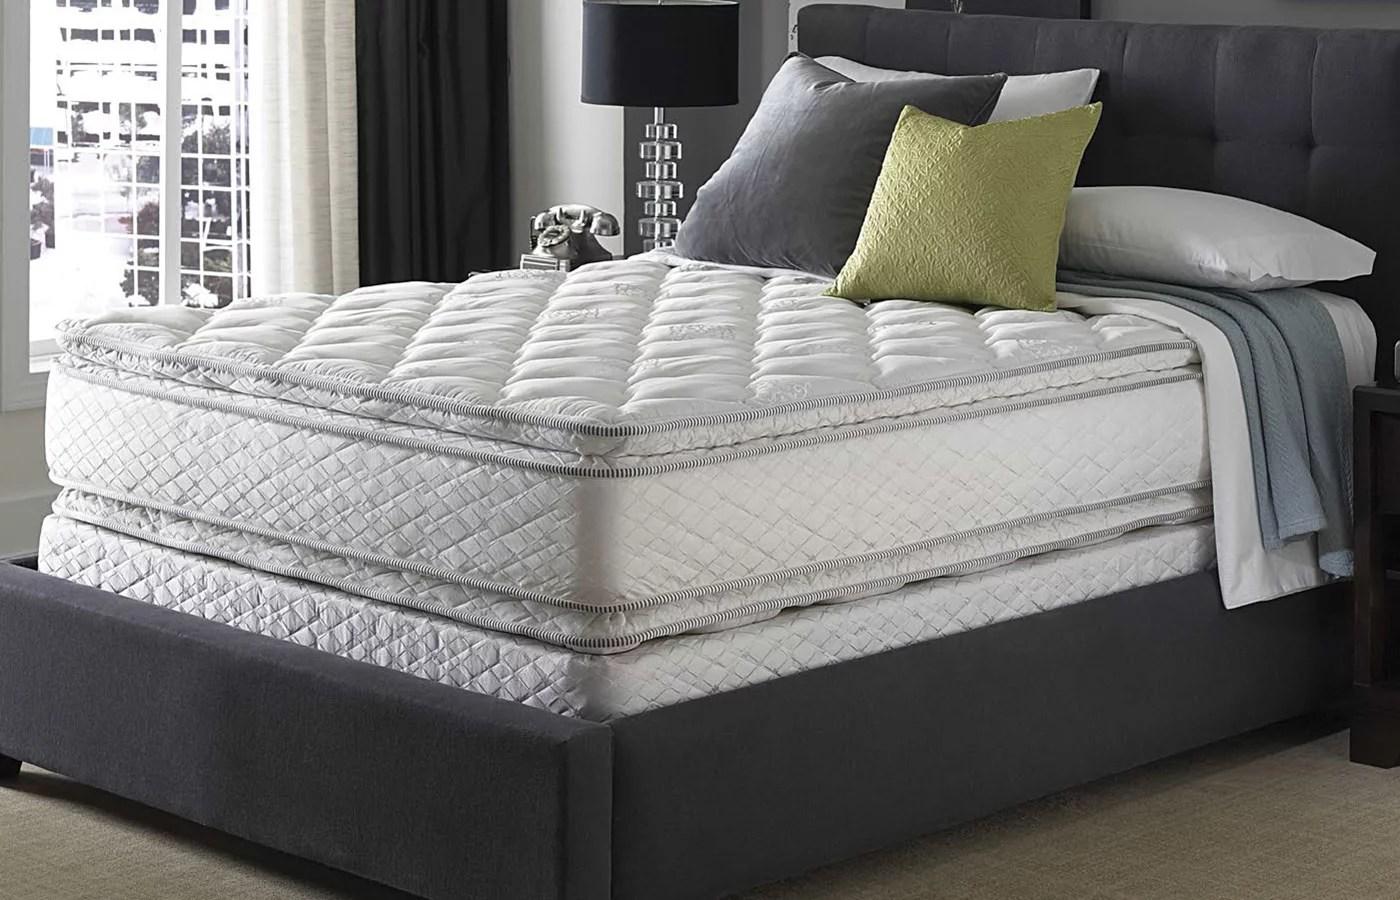 serta perfect sleeper sapphire suite double sided pillowtop mattress